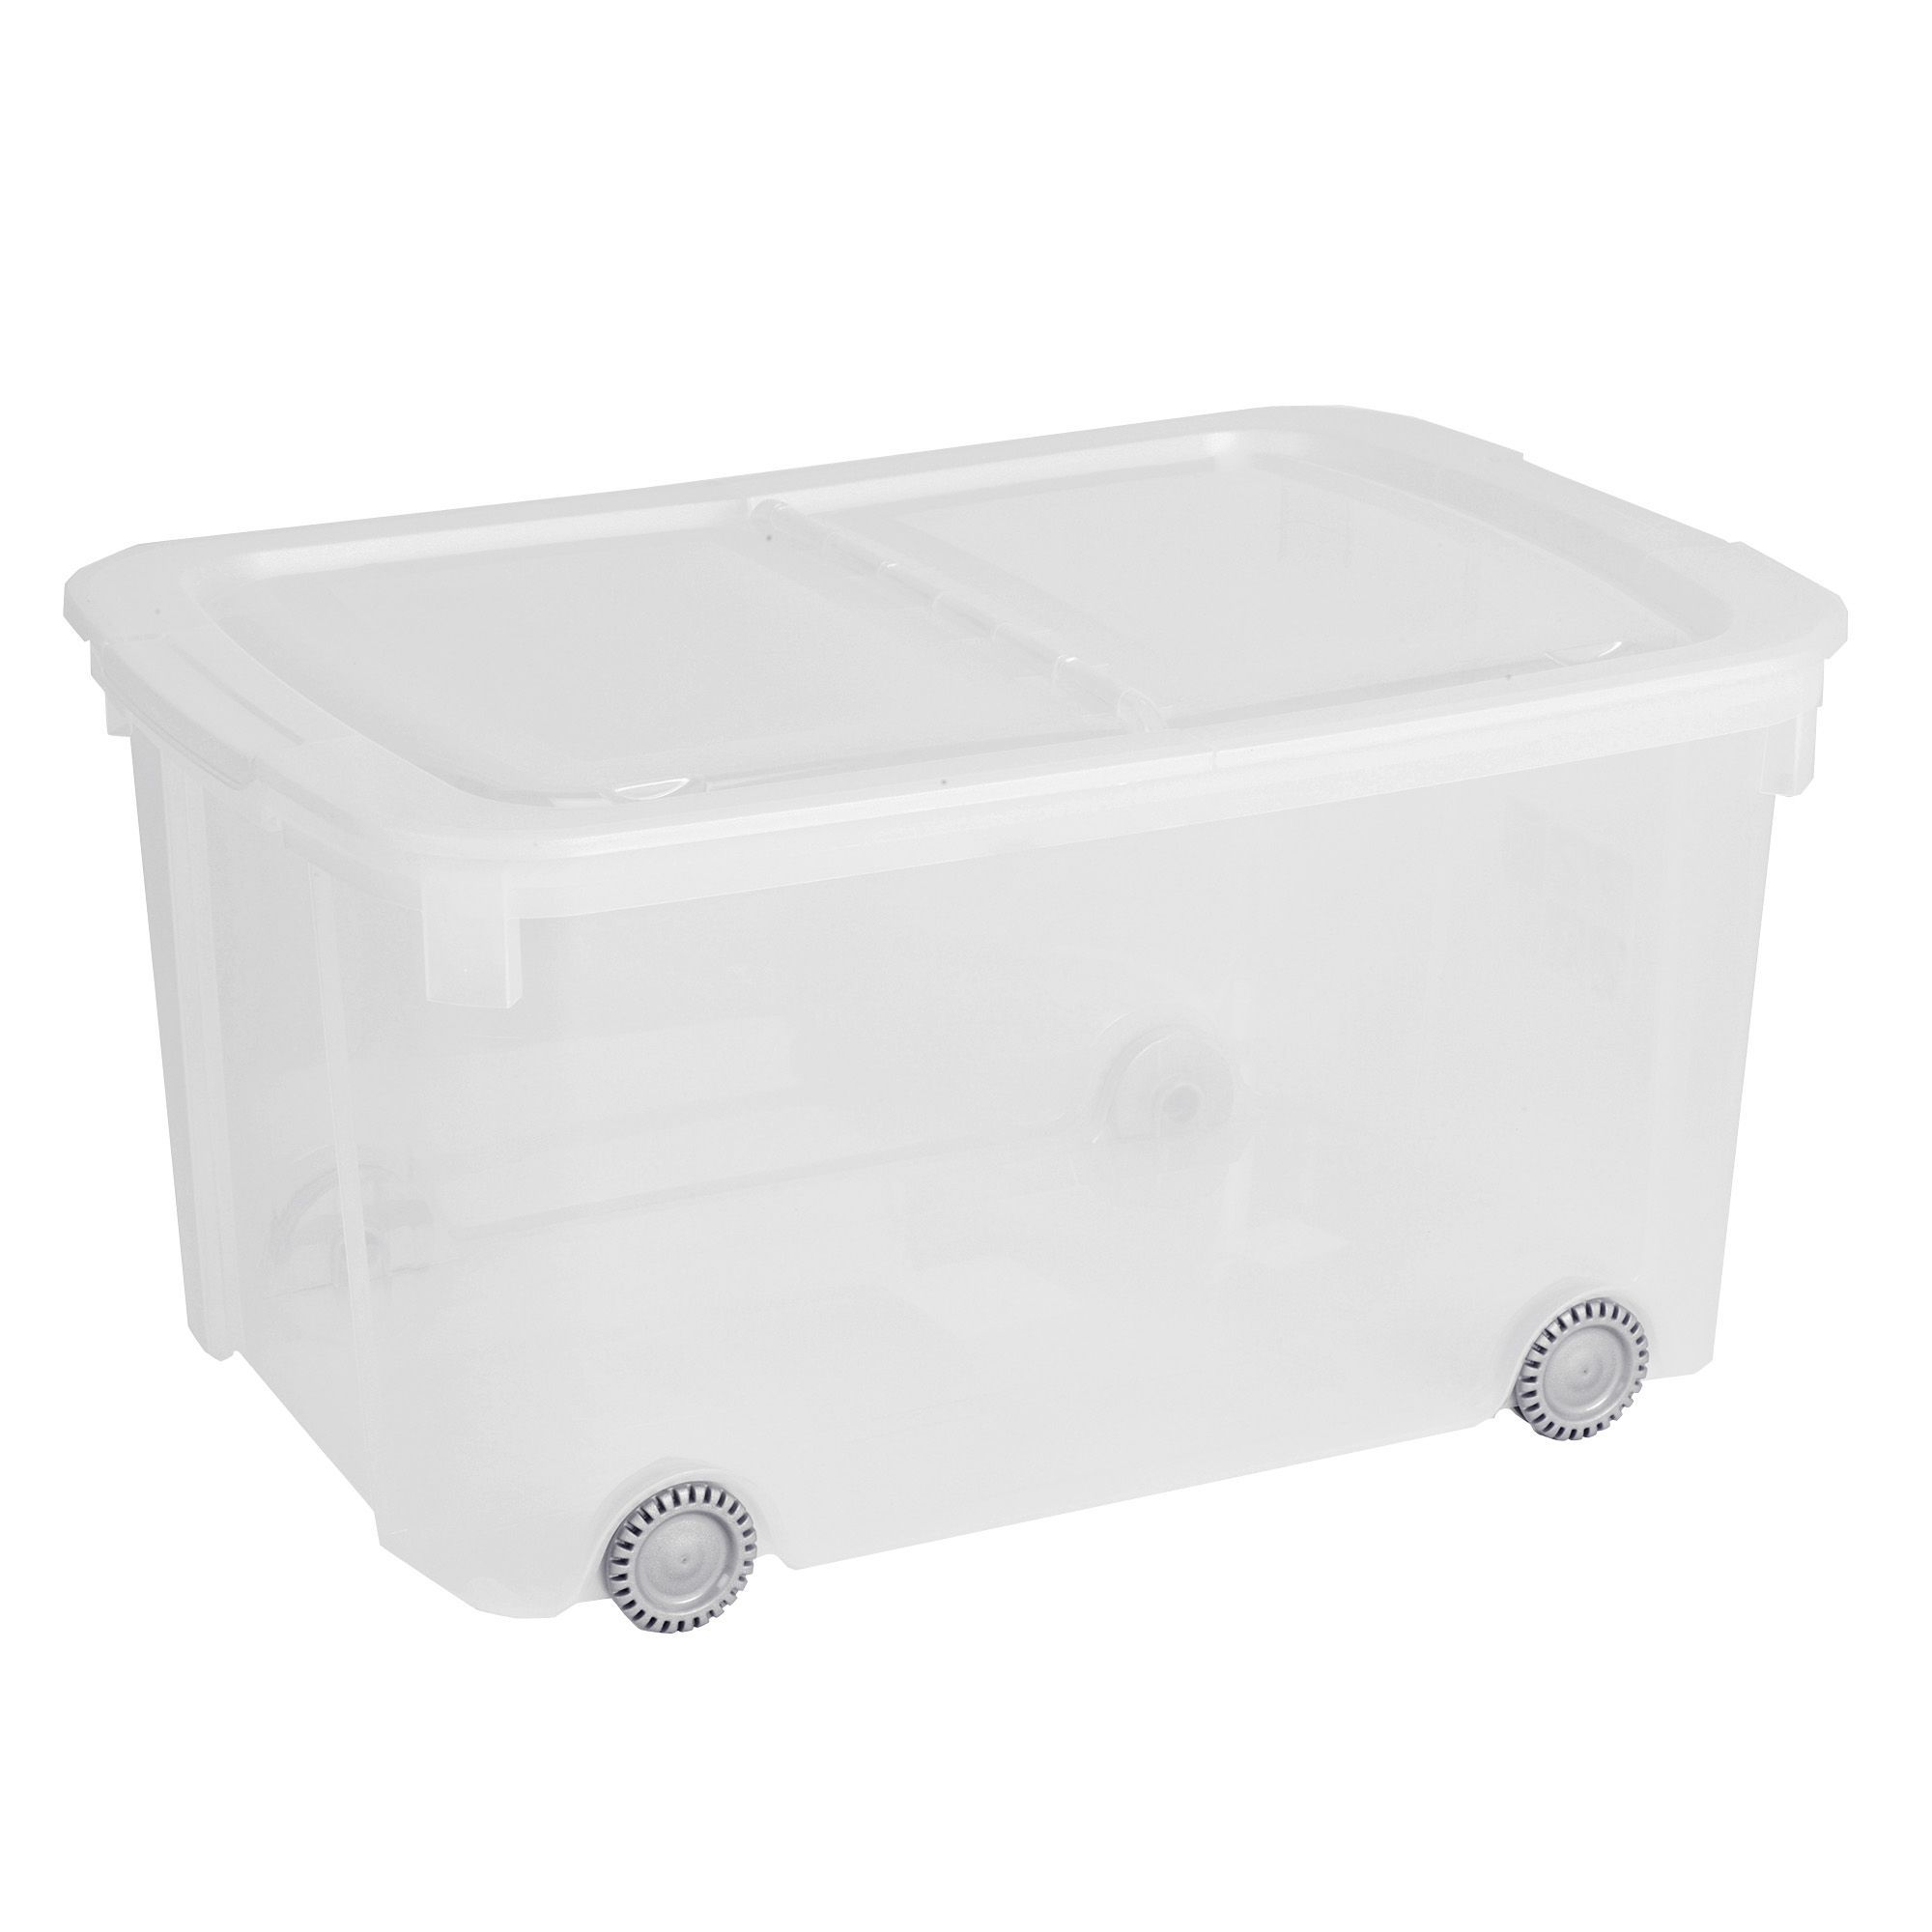 Curver Clear 51l Plastic Storage Box On Wheels